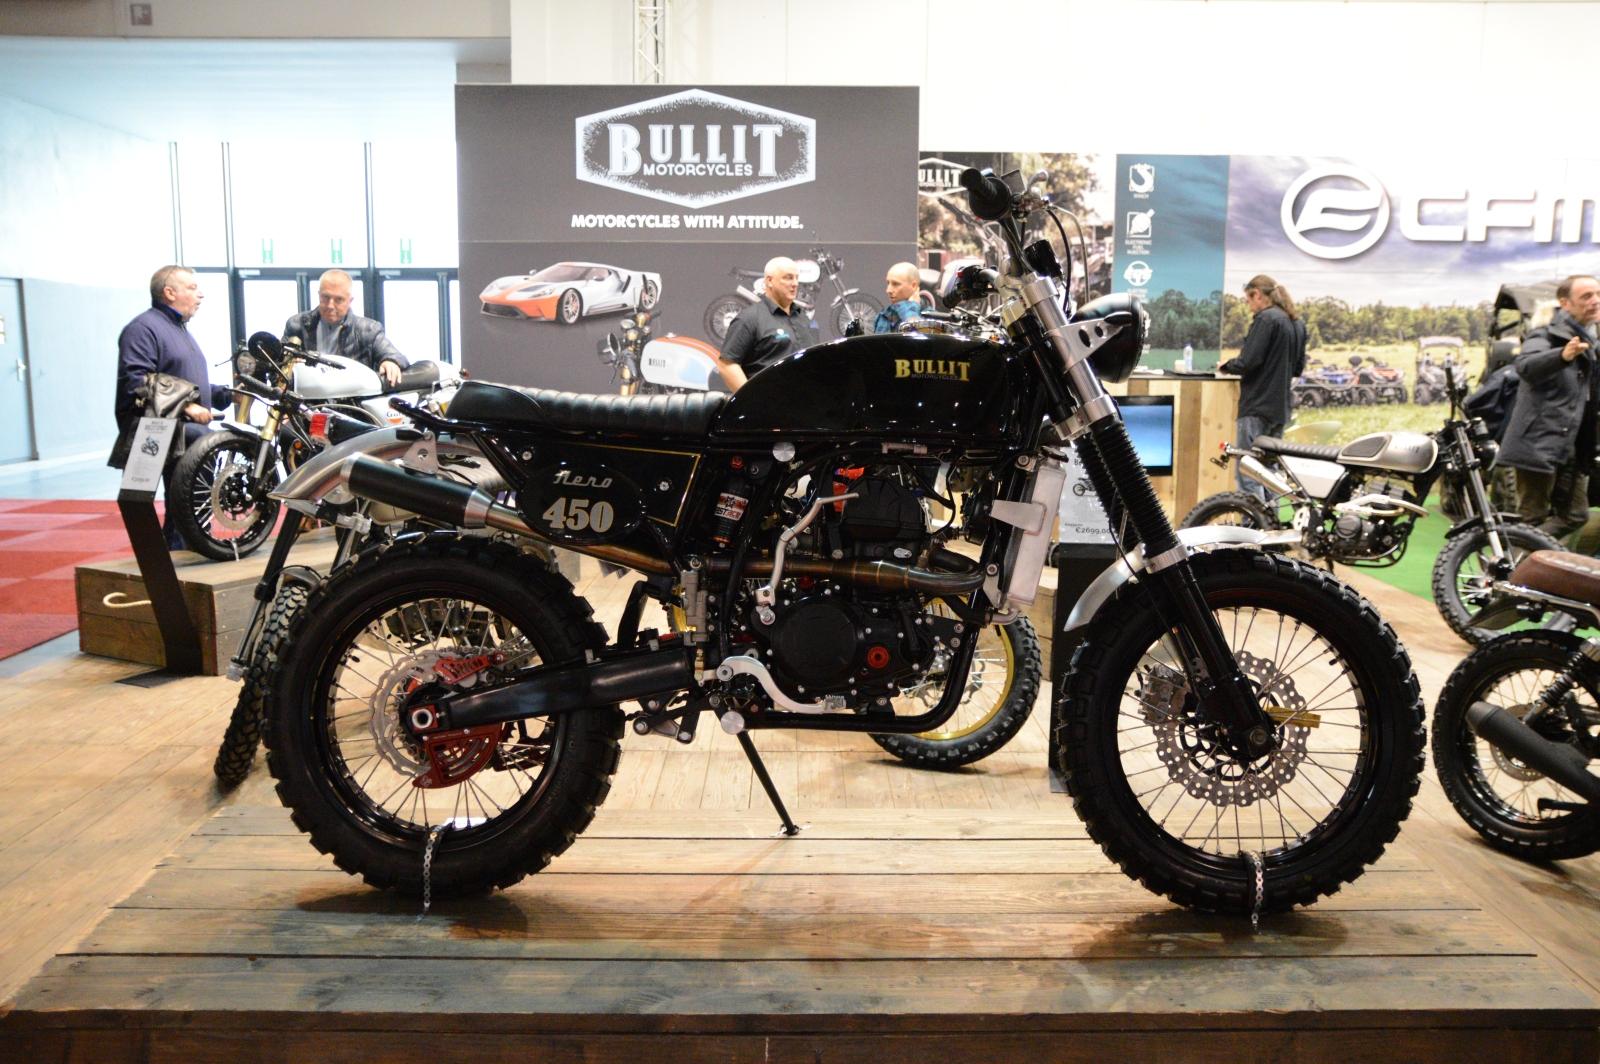 Brussels Motor Show 2019 - Bullit